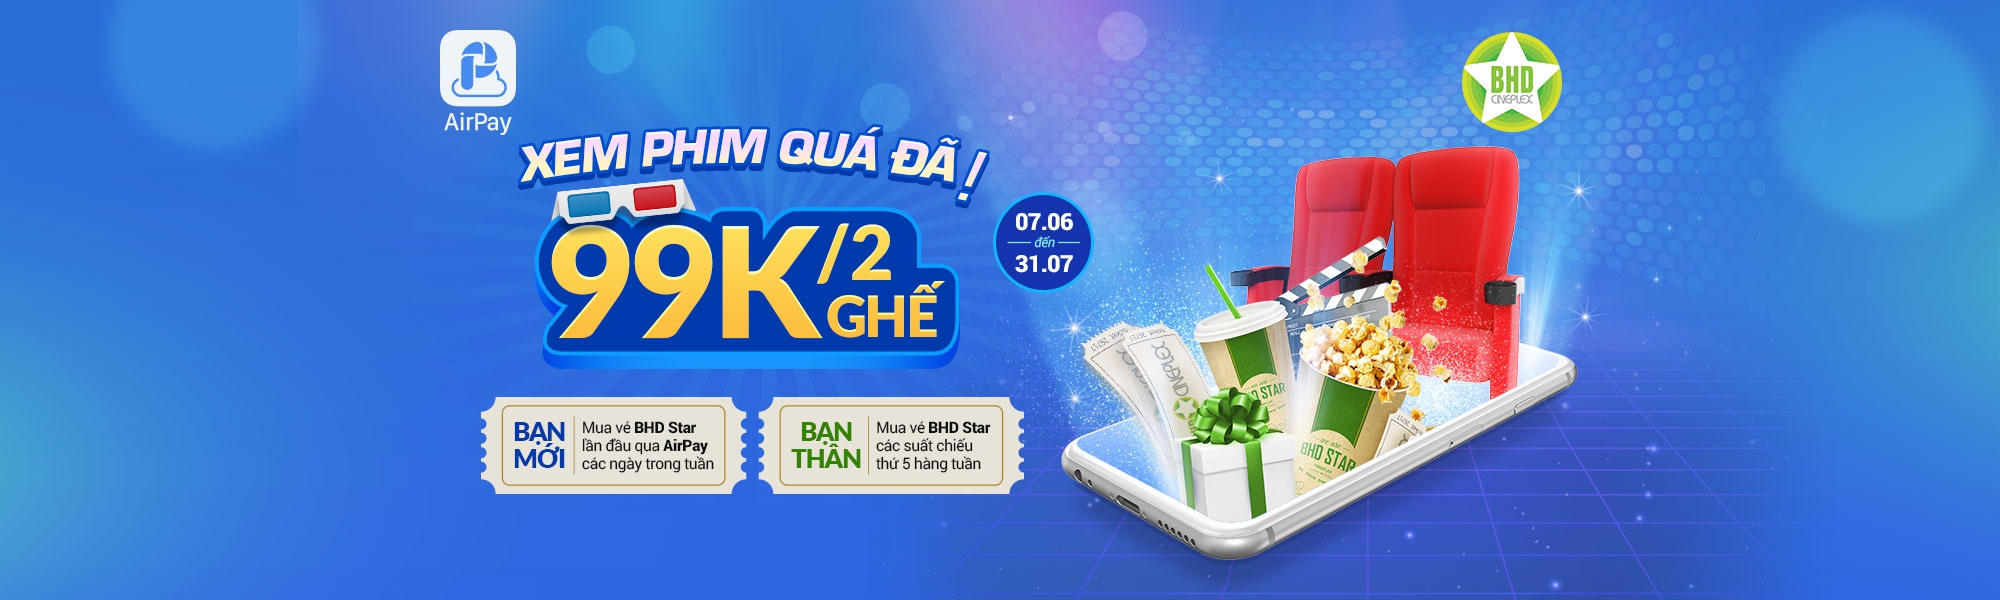 bhd-star-99k-2-ghe-jun-promotion